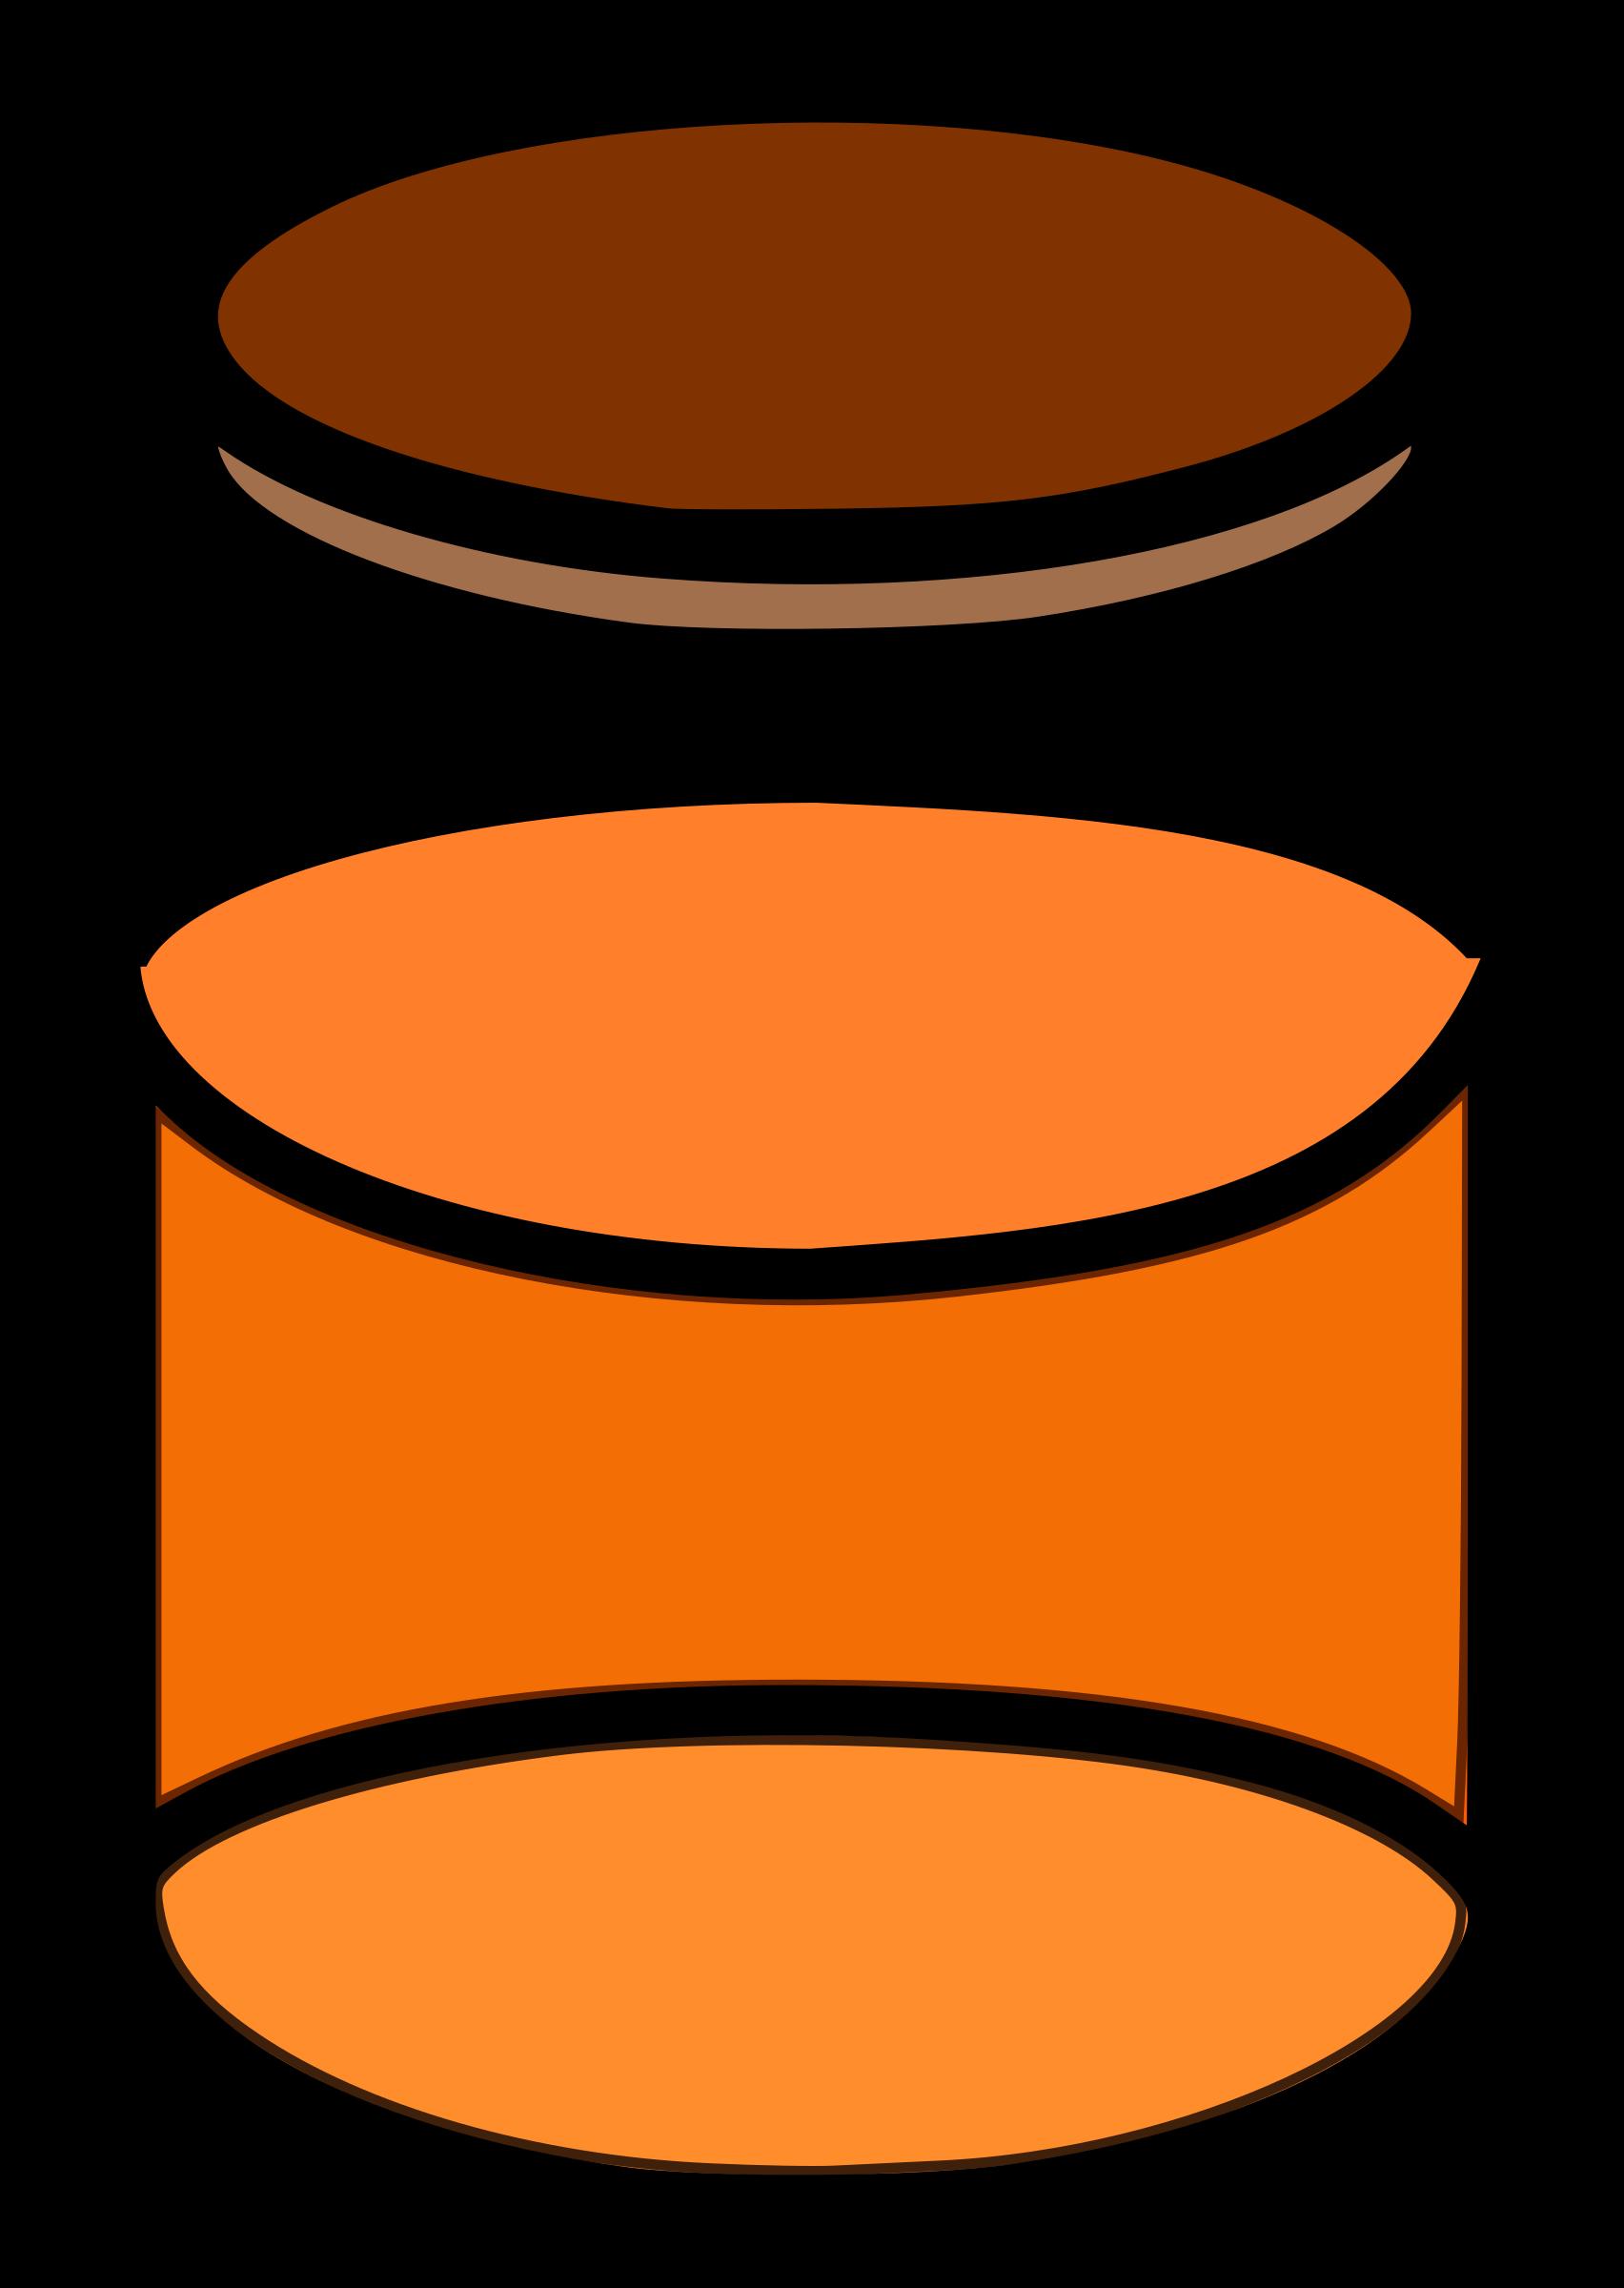 image transparent Jar clipart. Big free on dumielauxepices.